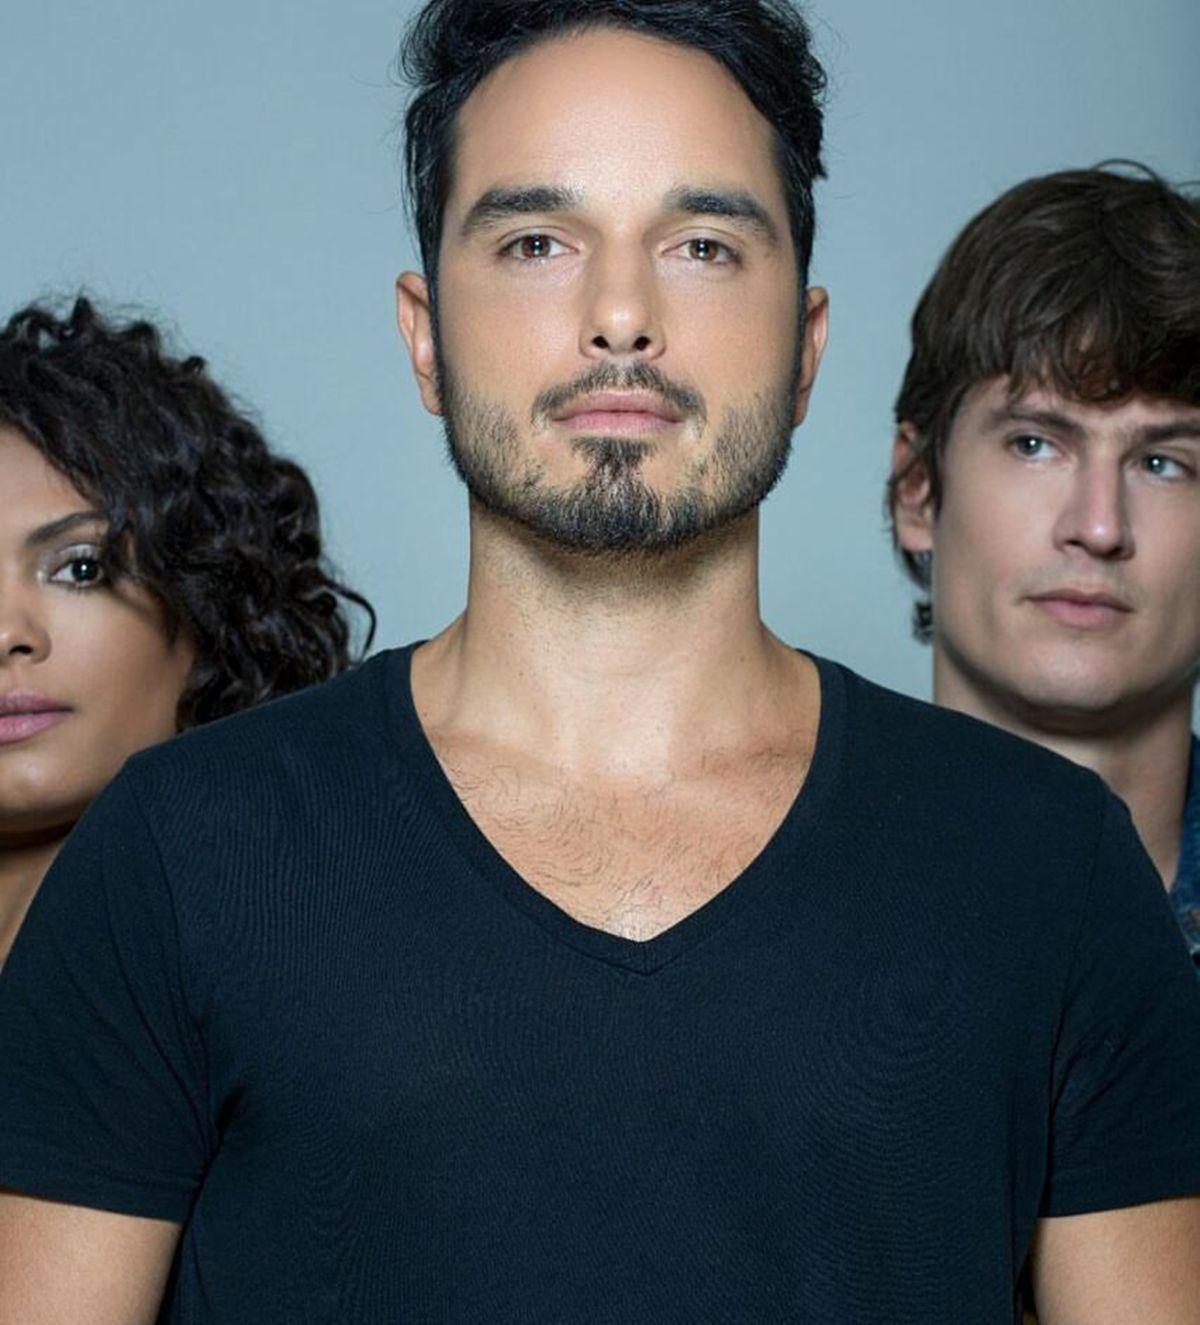 Atriz Lidi Lisboa rochasemcores�   no palco   – entrevista: l�o rosa, lidi